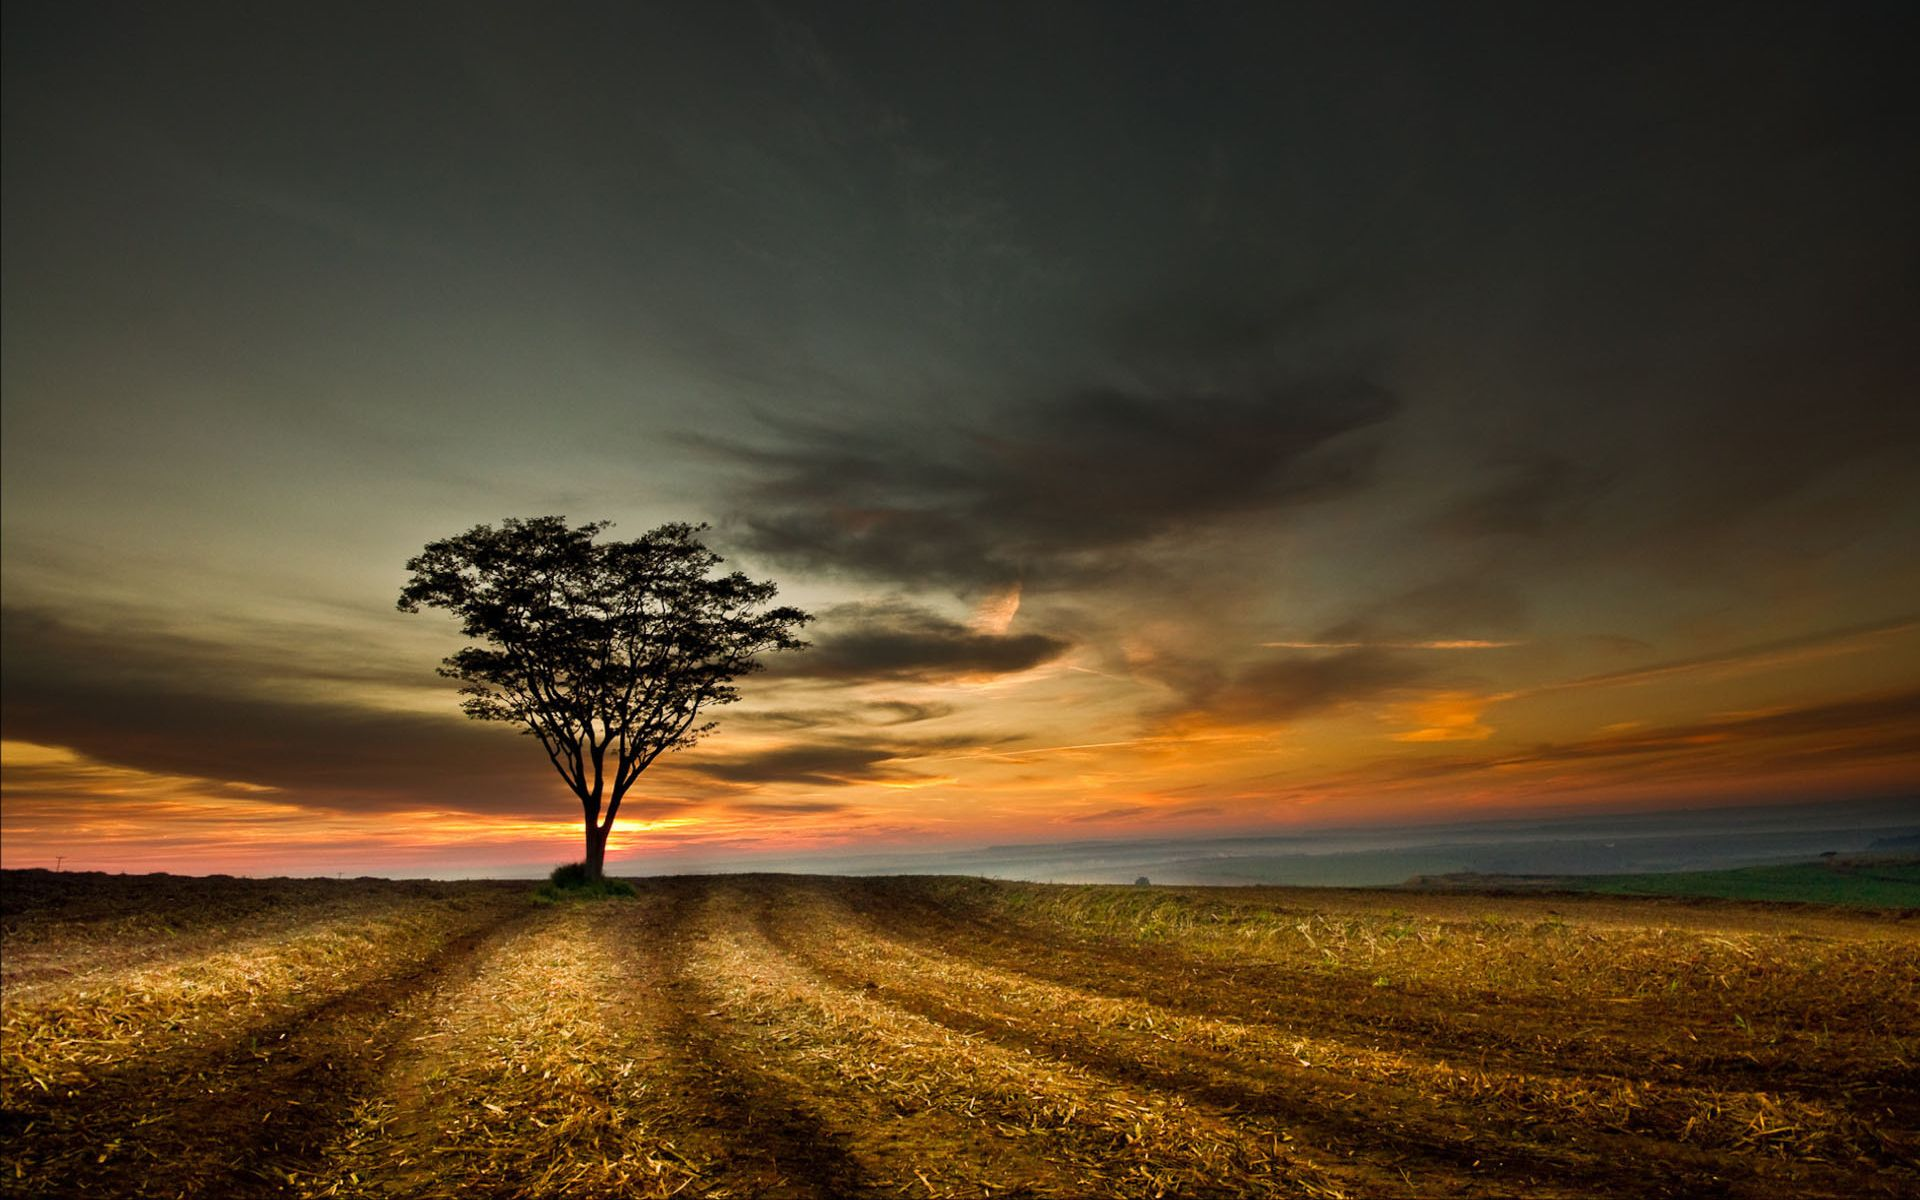 Tree of the fields